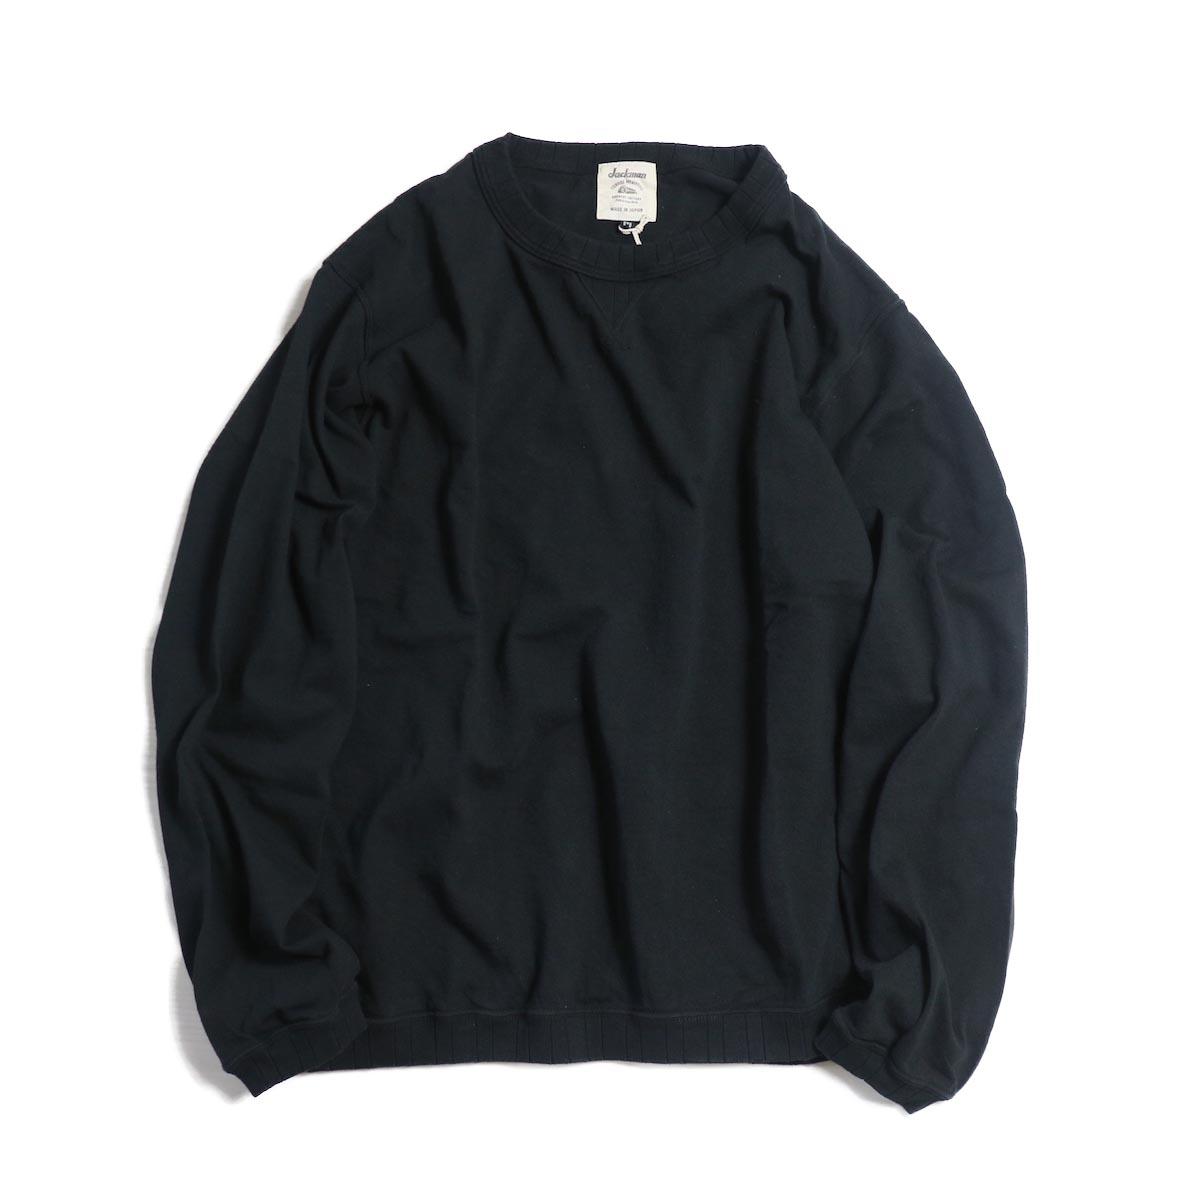 Jackman / Rib Long Sleeve -BLACK